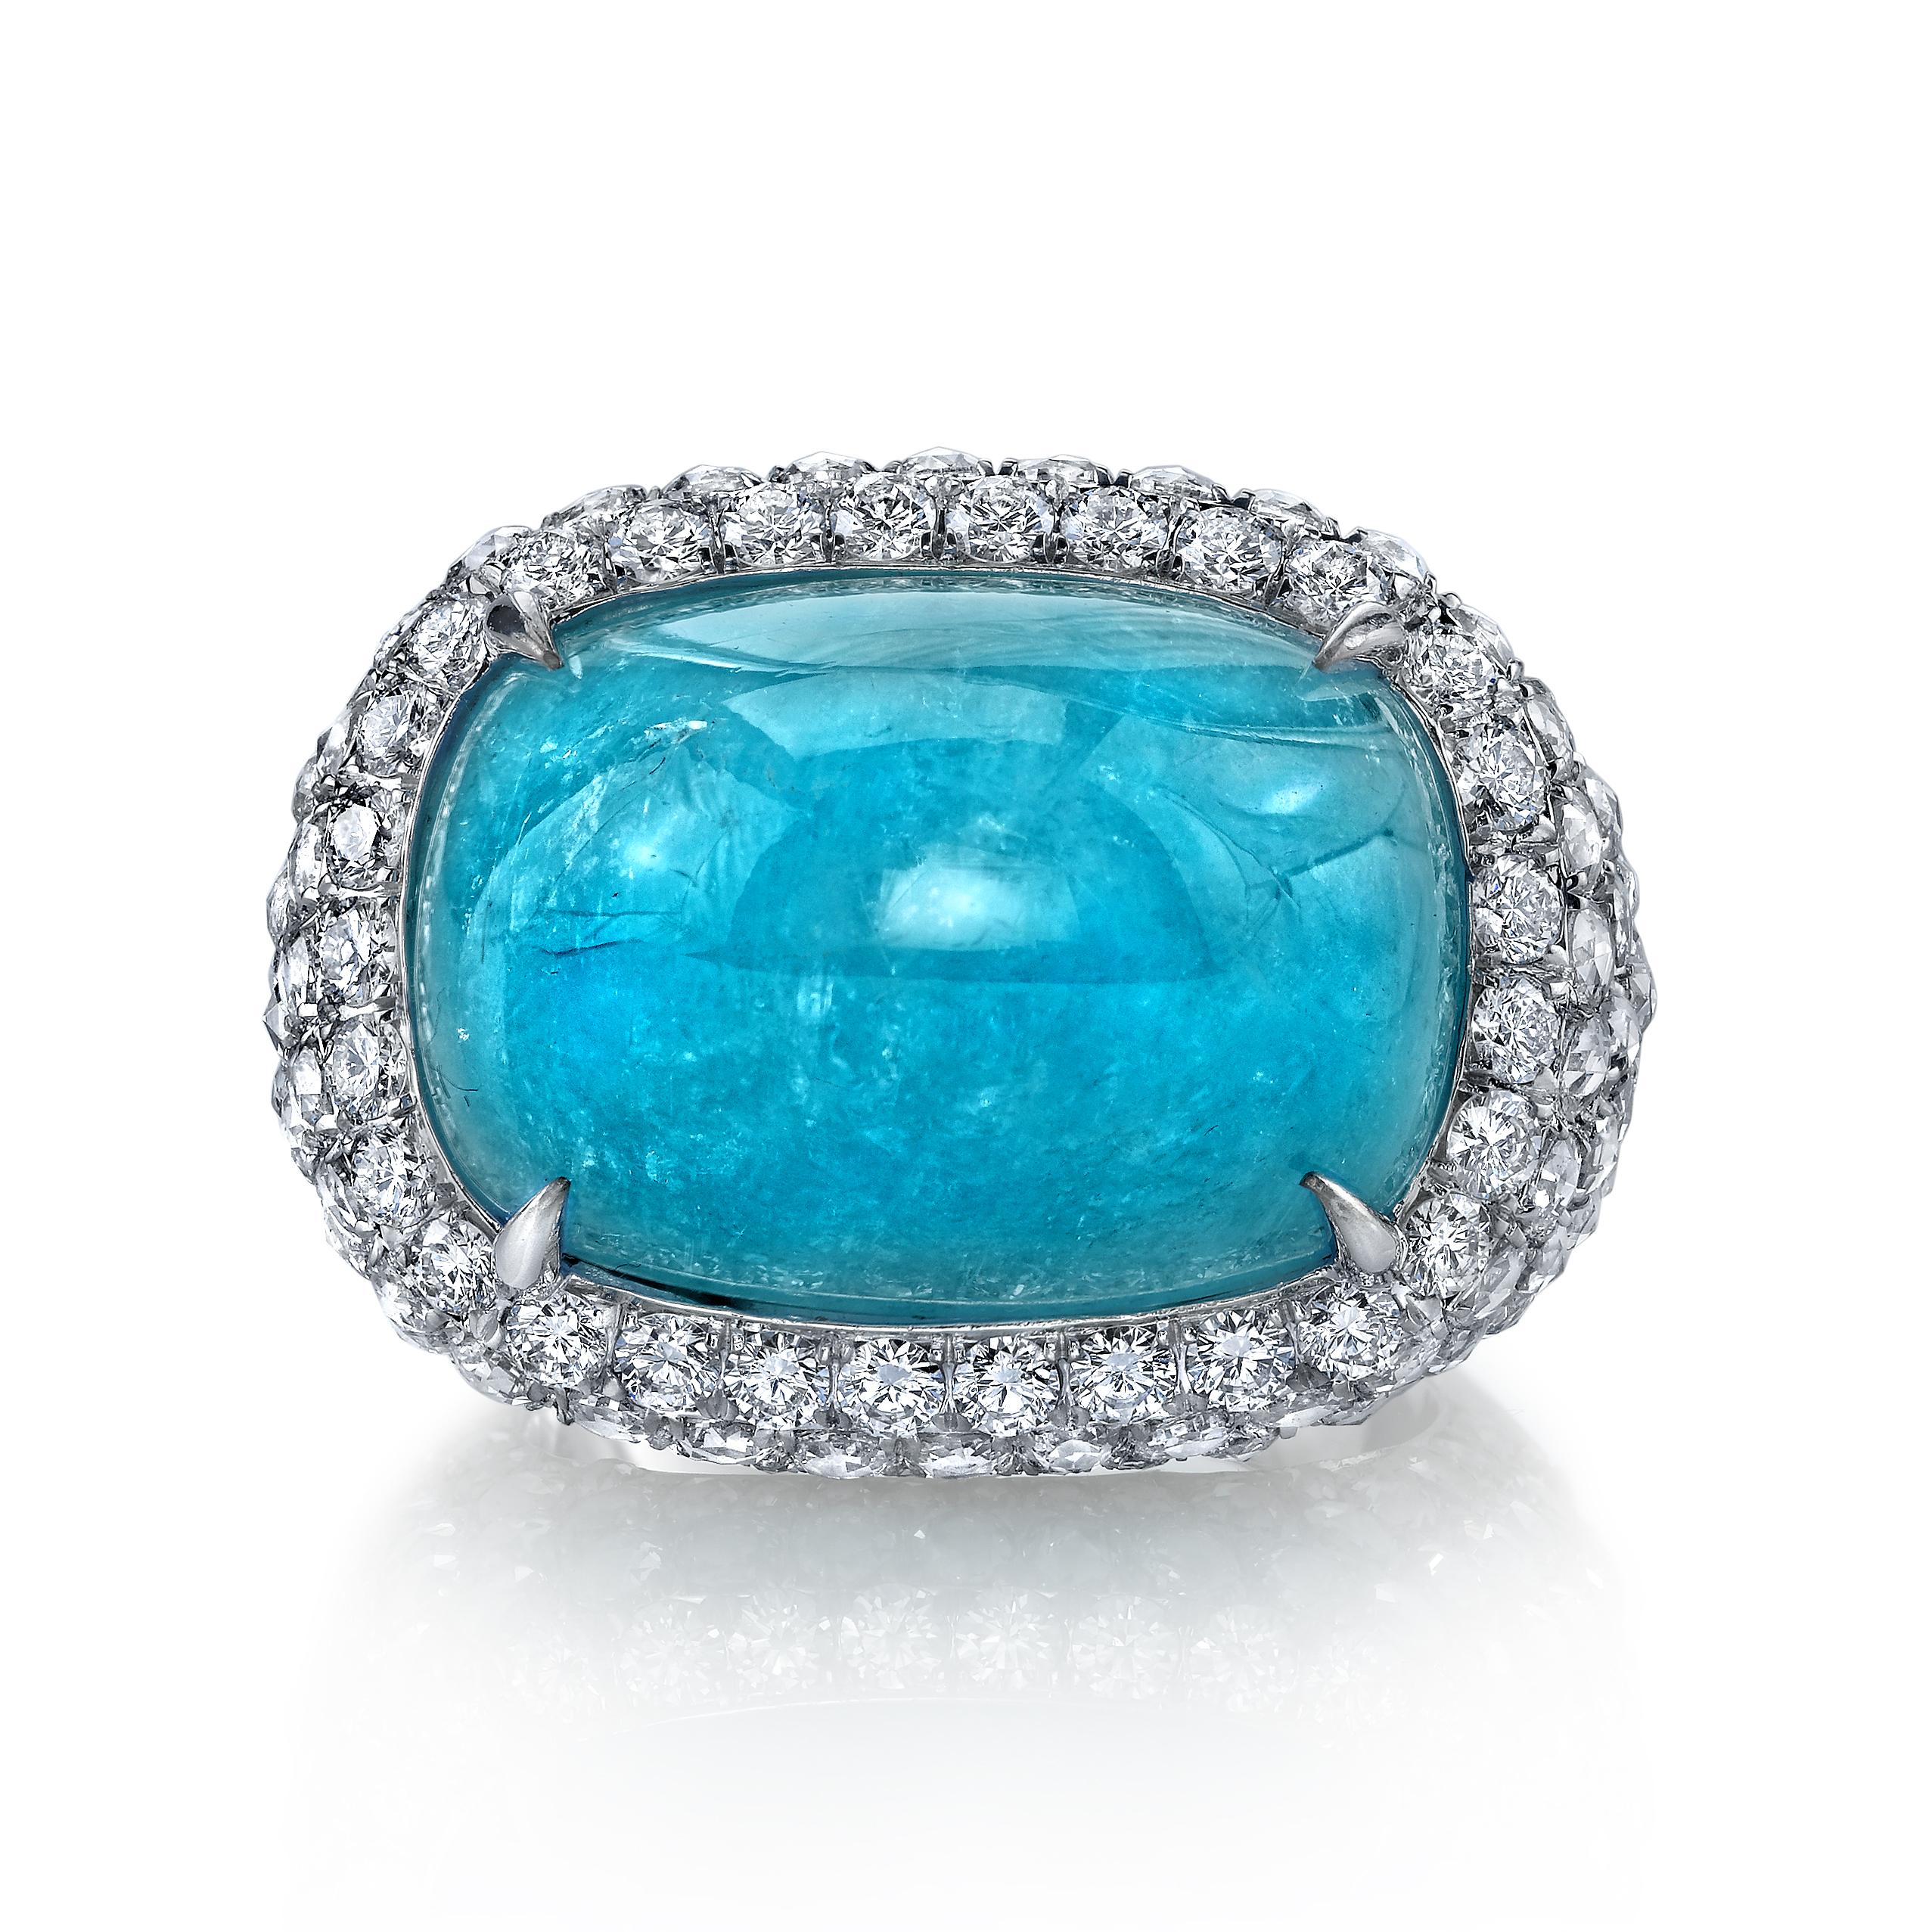 Paraiba Cocktail Ring